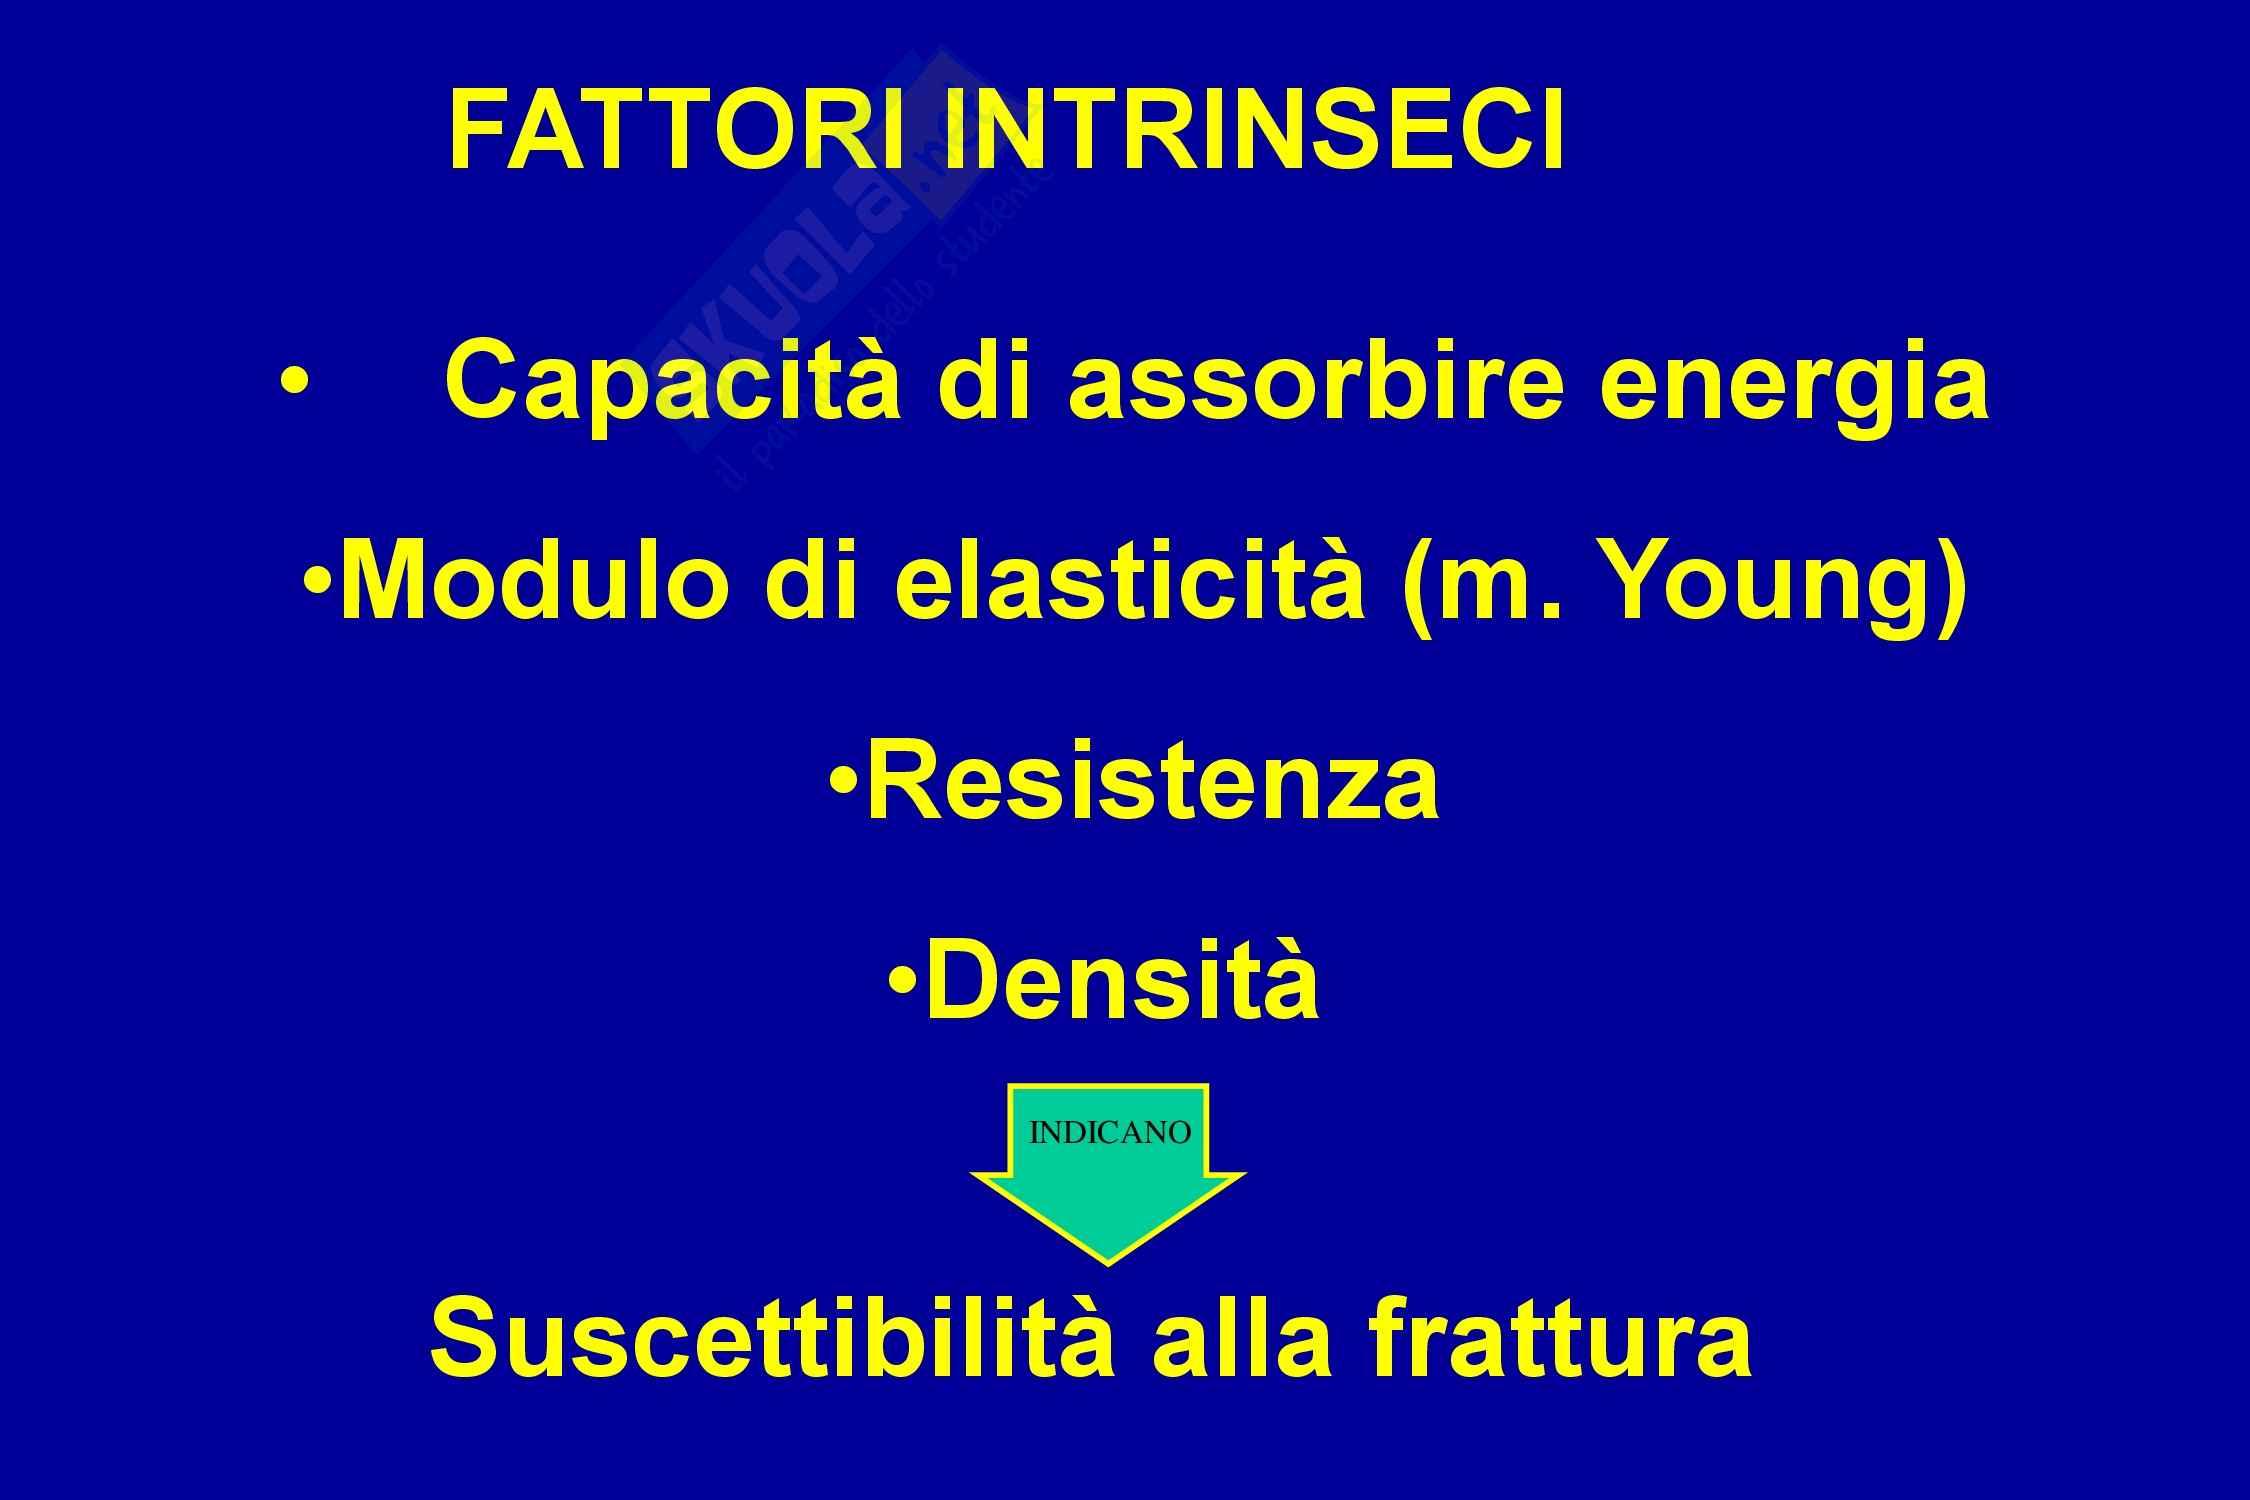 Ortopedia - Fratture Pag. 11